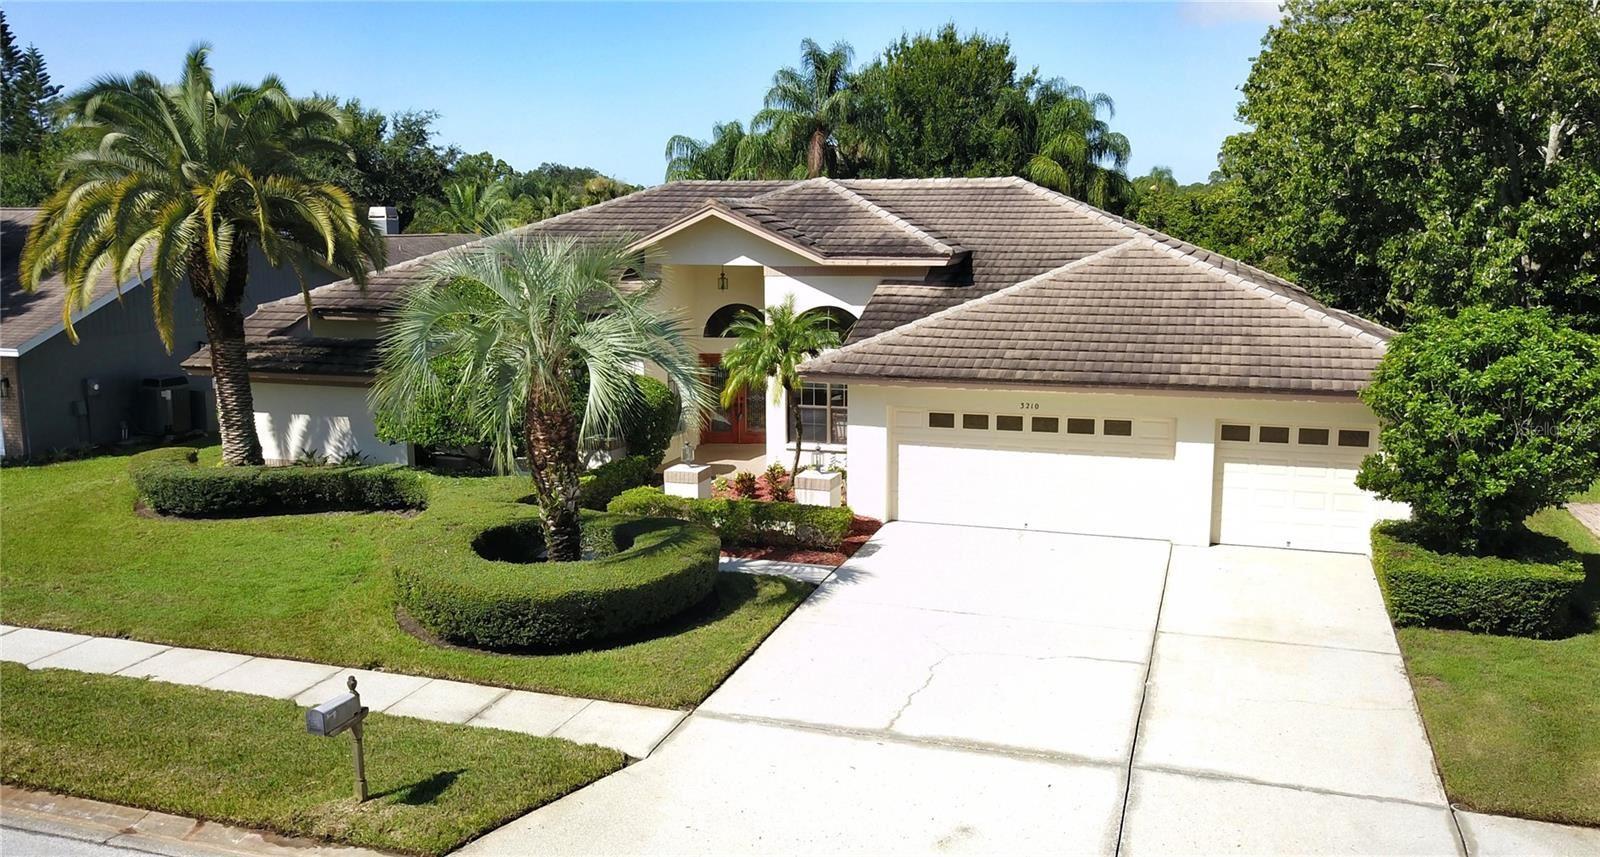 3210 VALEMOOR DRIVE, Palm Harbor, FL 34685 - #: U8132856